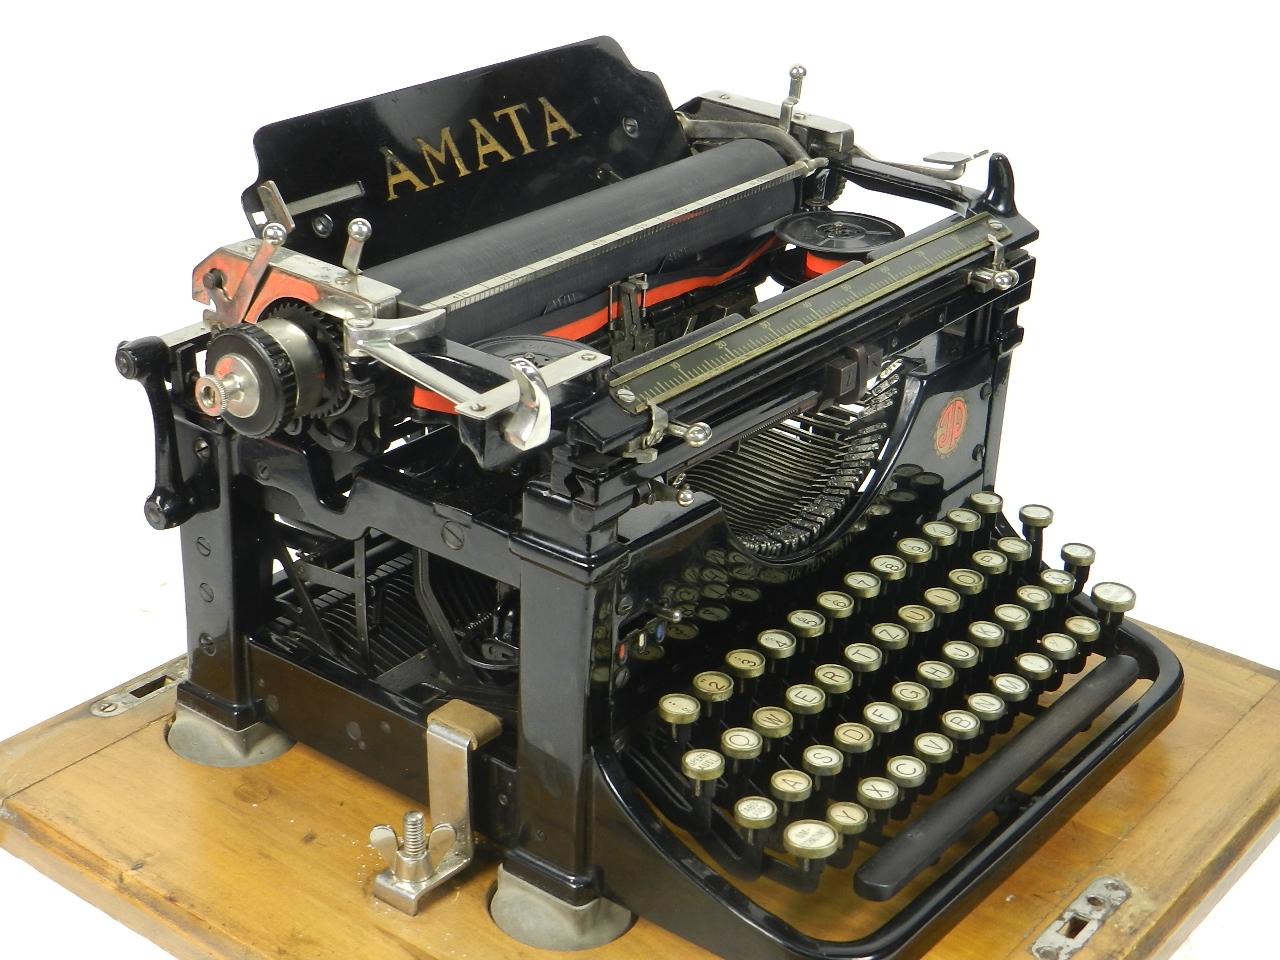 Imagen RARA AMATA, AÑO 1923, AUSTRIA 28960